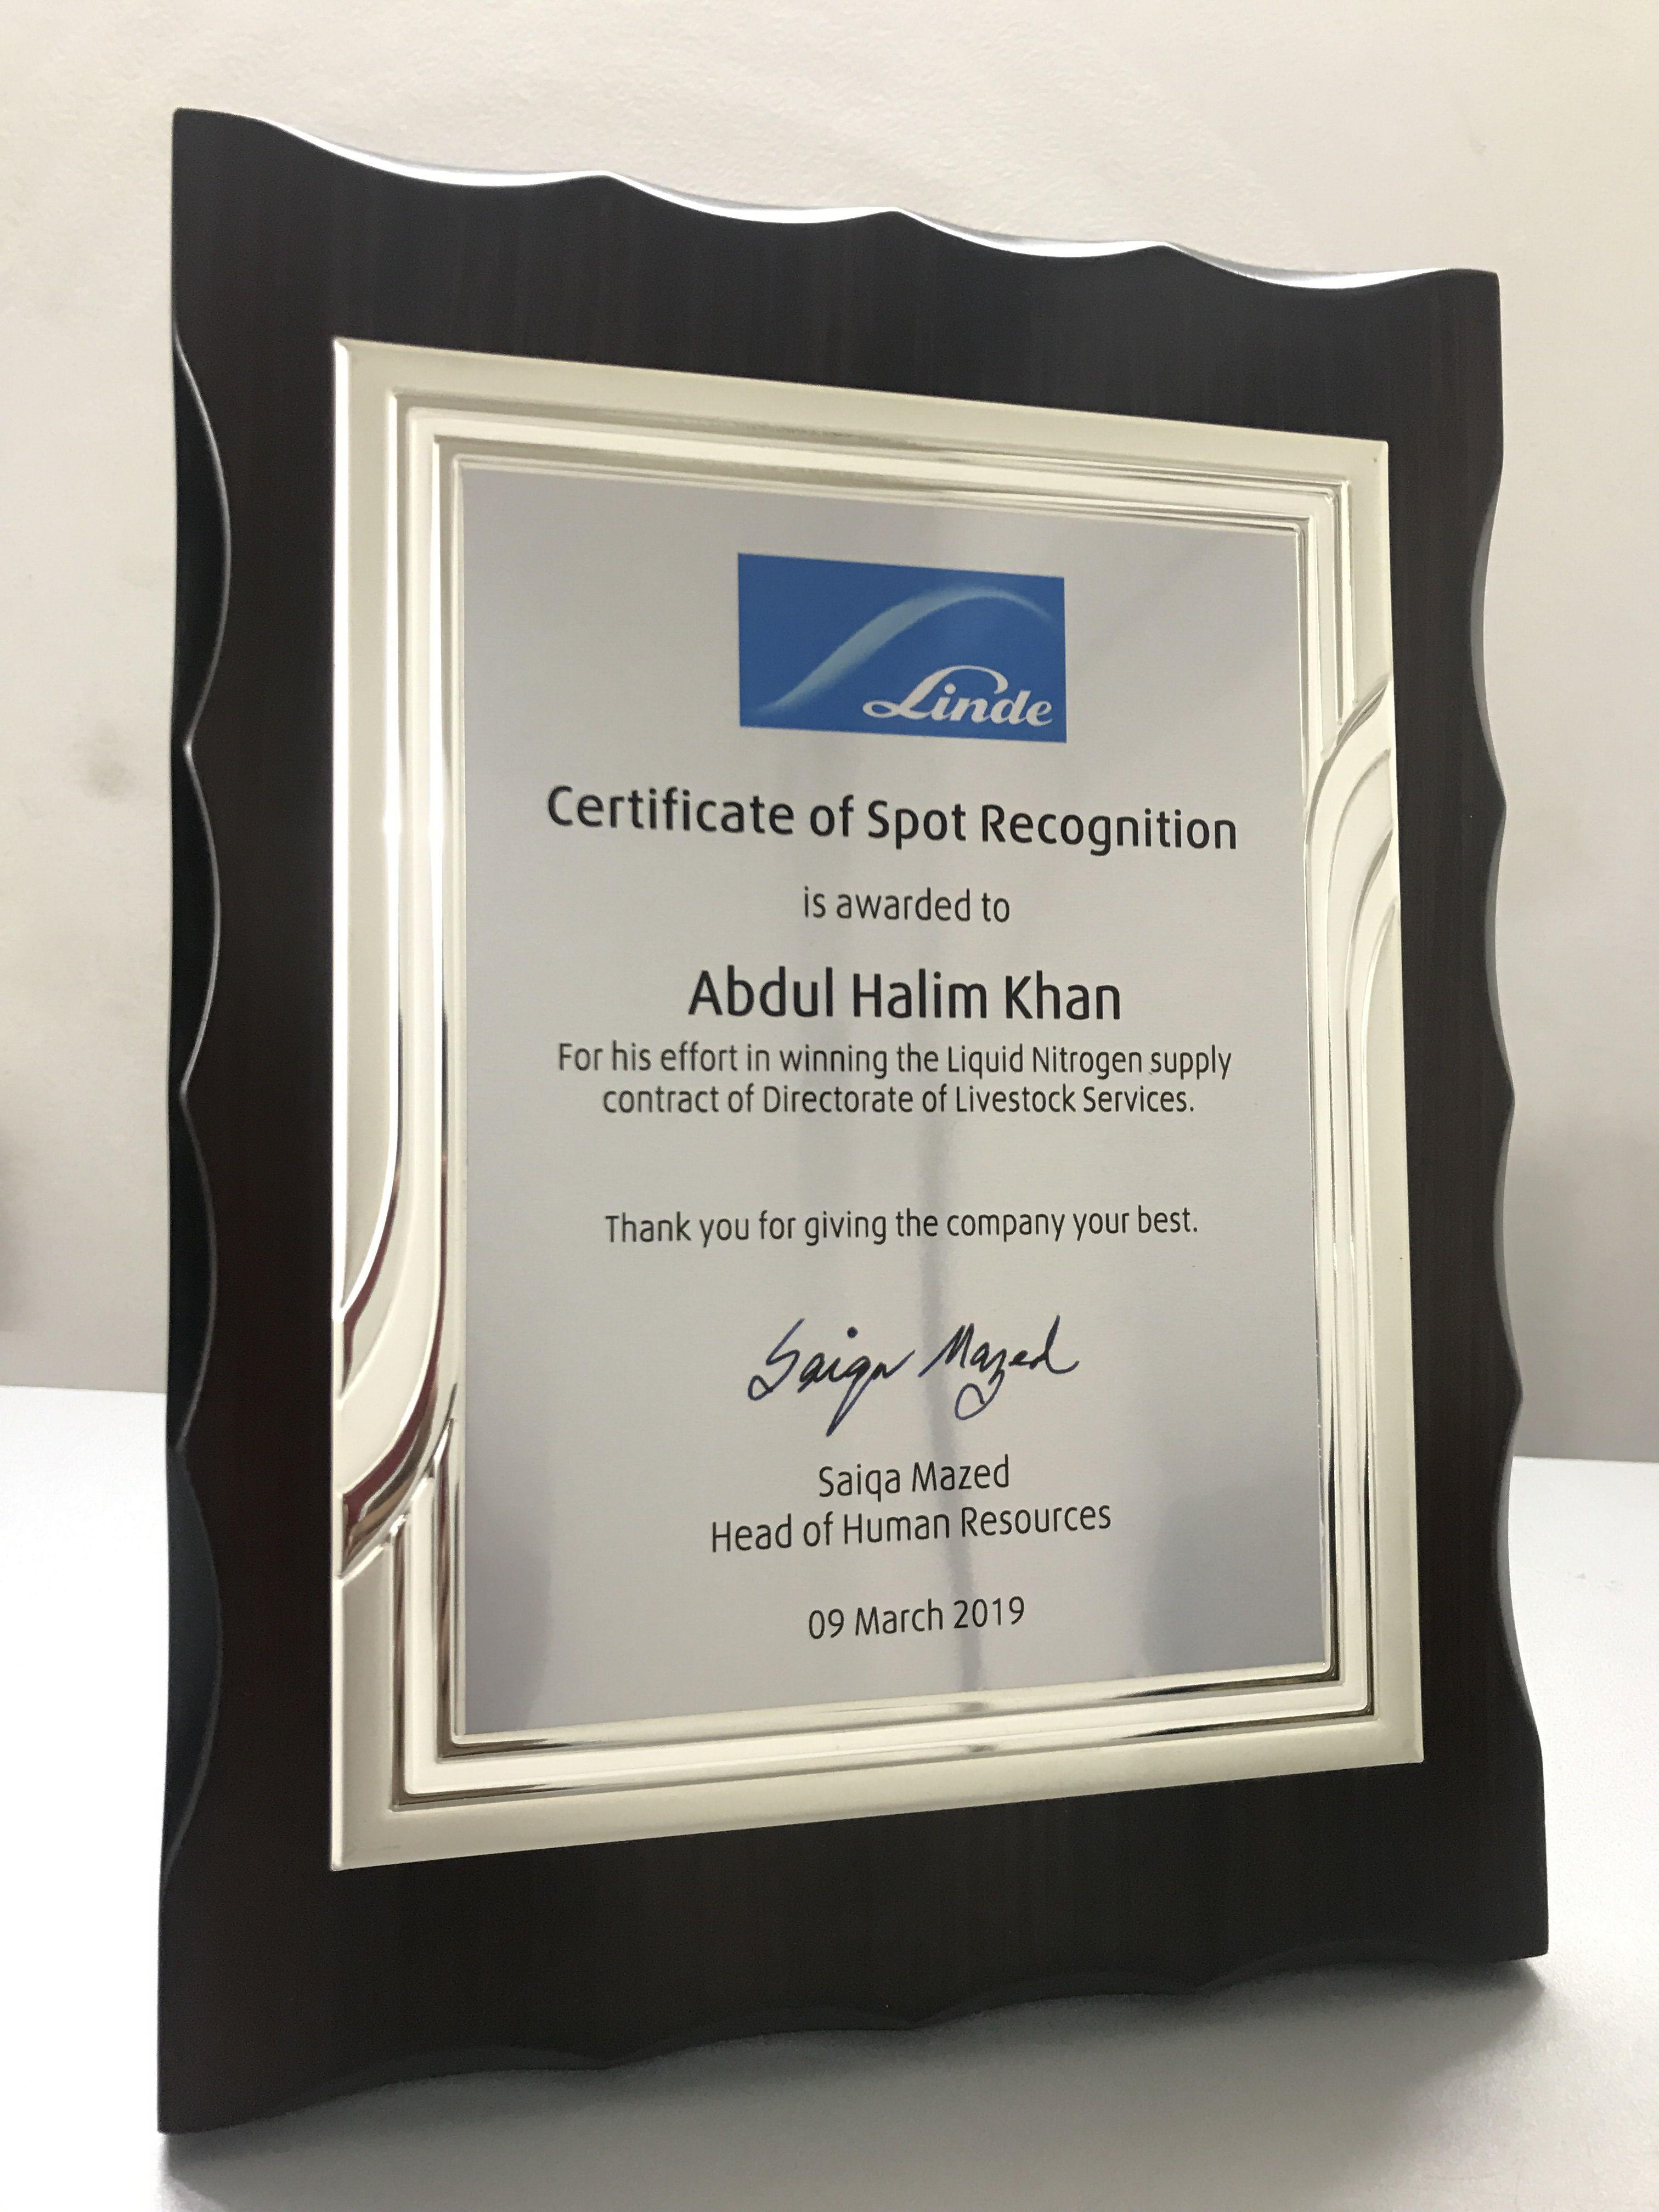 certificate crest awards appreciation military